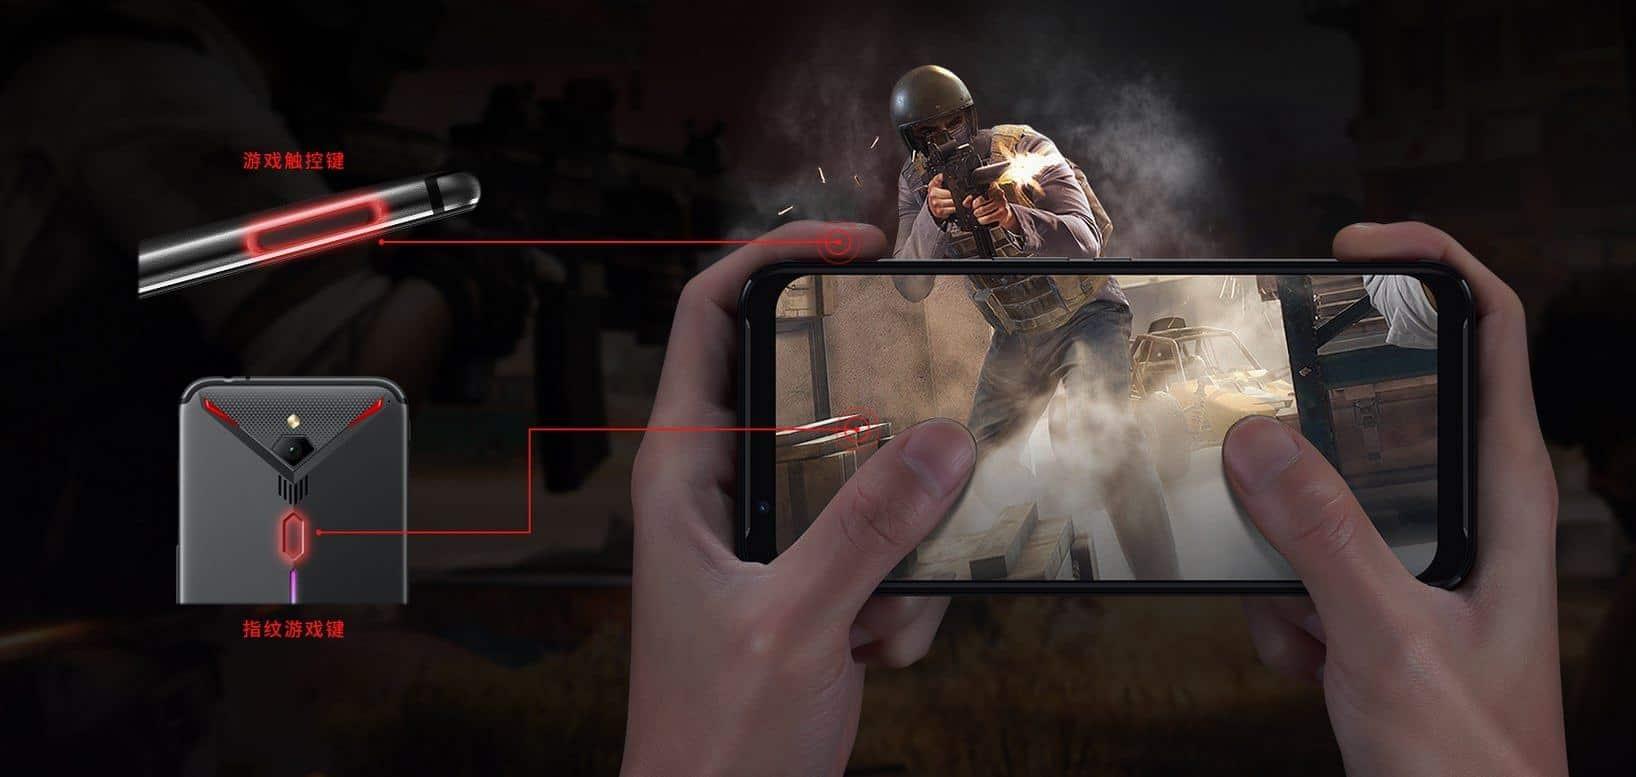 Nubia เปิดตัว Red Magic 3 มือถือเพื่อการเล่นเกม ใช้ SNAP855 จอ 90 Hz มีพัดลมระบายอากาศ 4